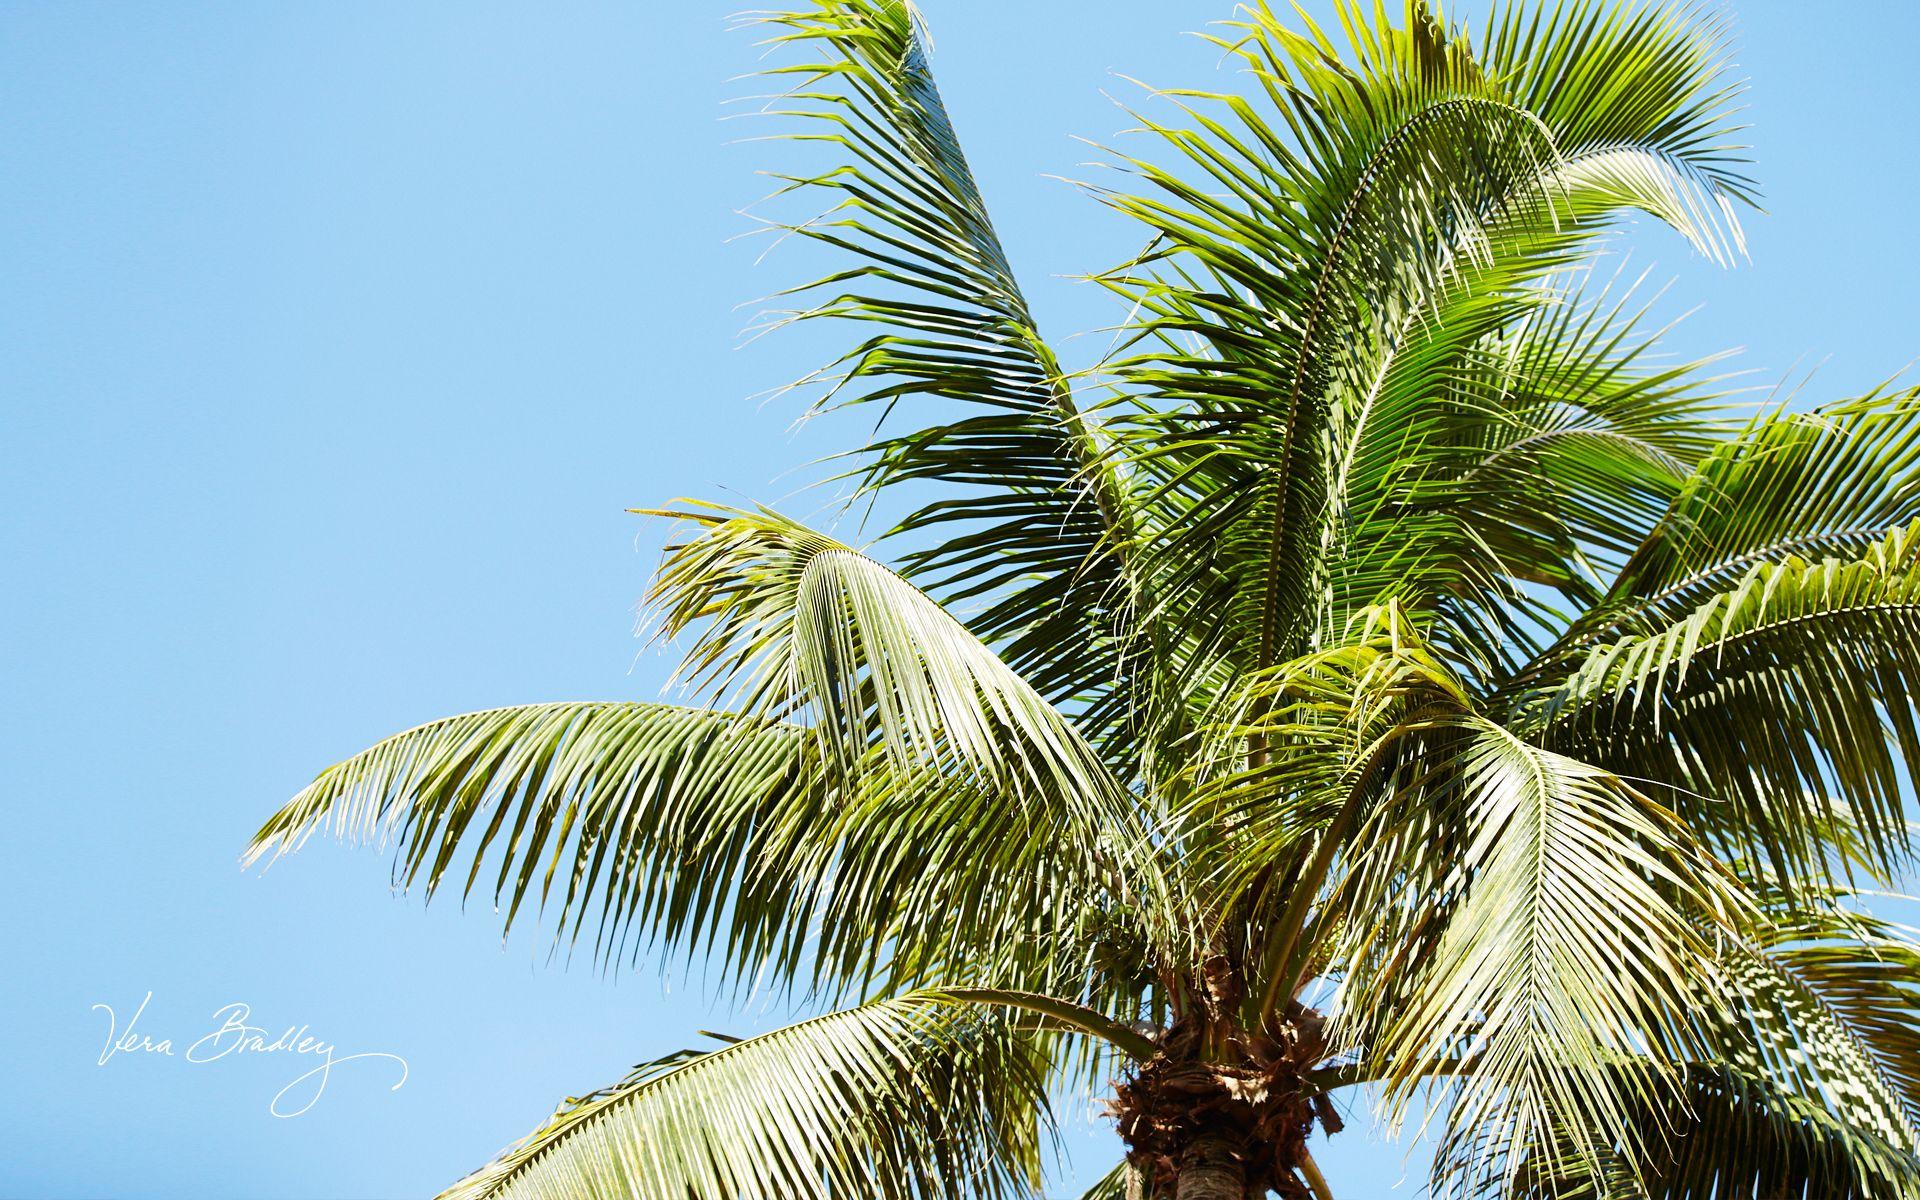 Vera Bradley Palm Tree Desktop Wallpaper | Downloadable Desktops ...